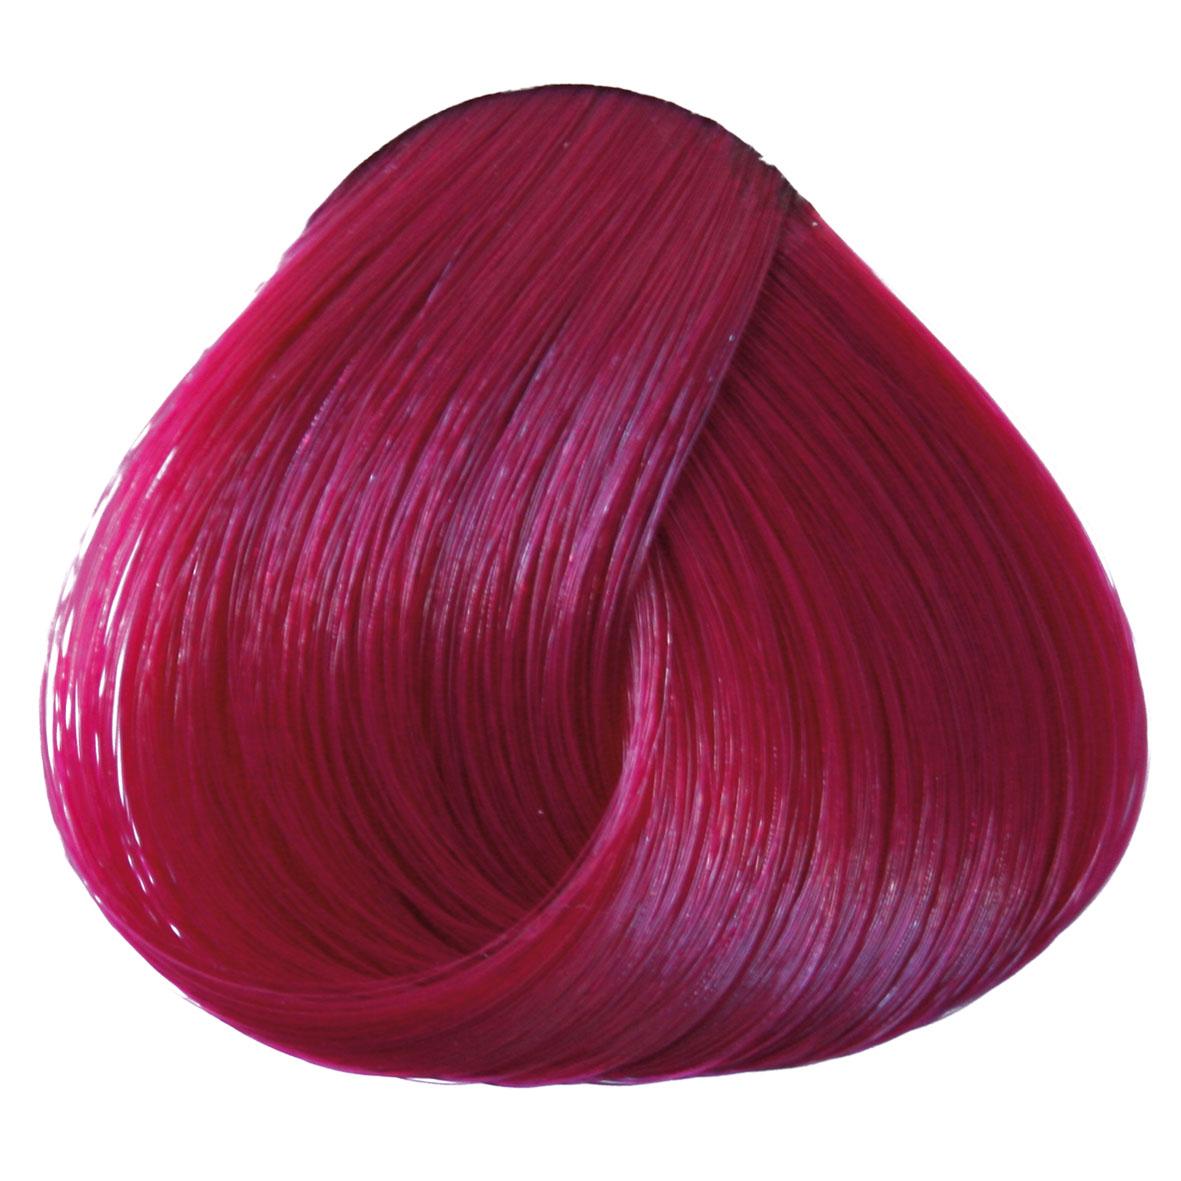 directions color rose red 89ml 1010058 van rijn kappersgroothandel. Black Bedroom Furniture Sets. Home Design Ideas